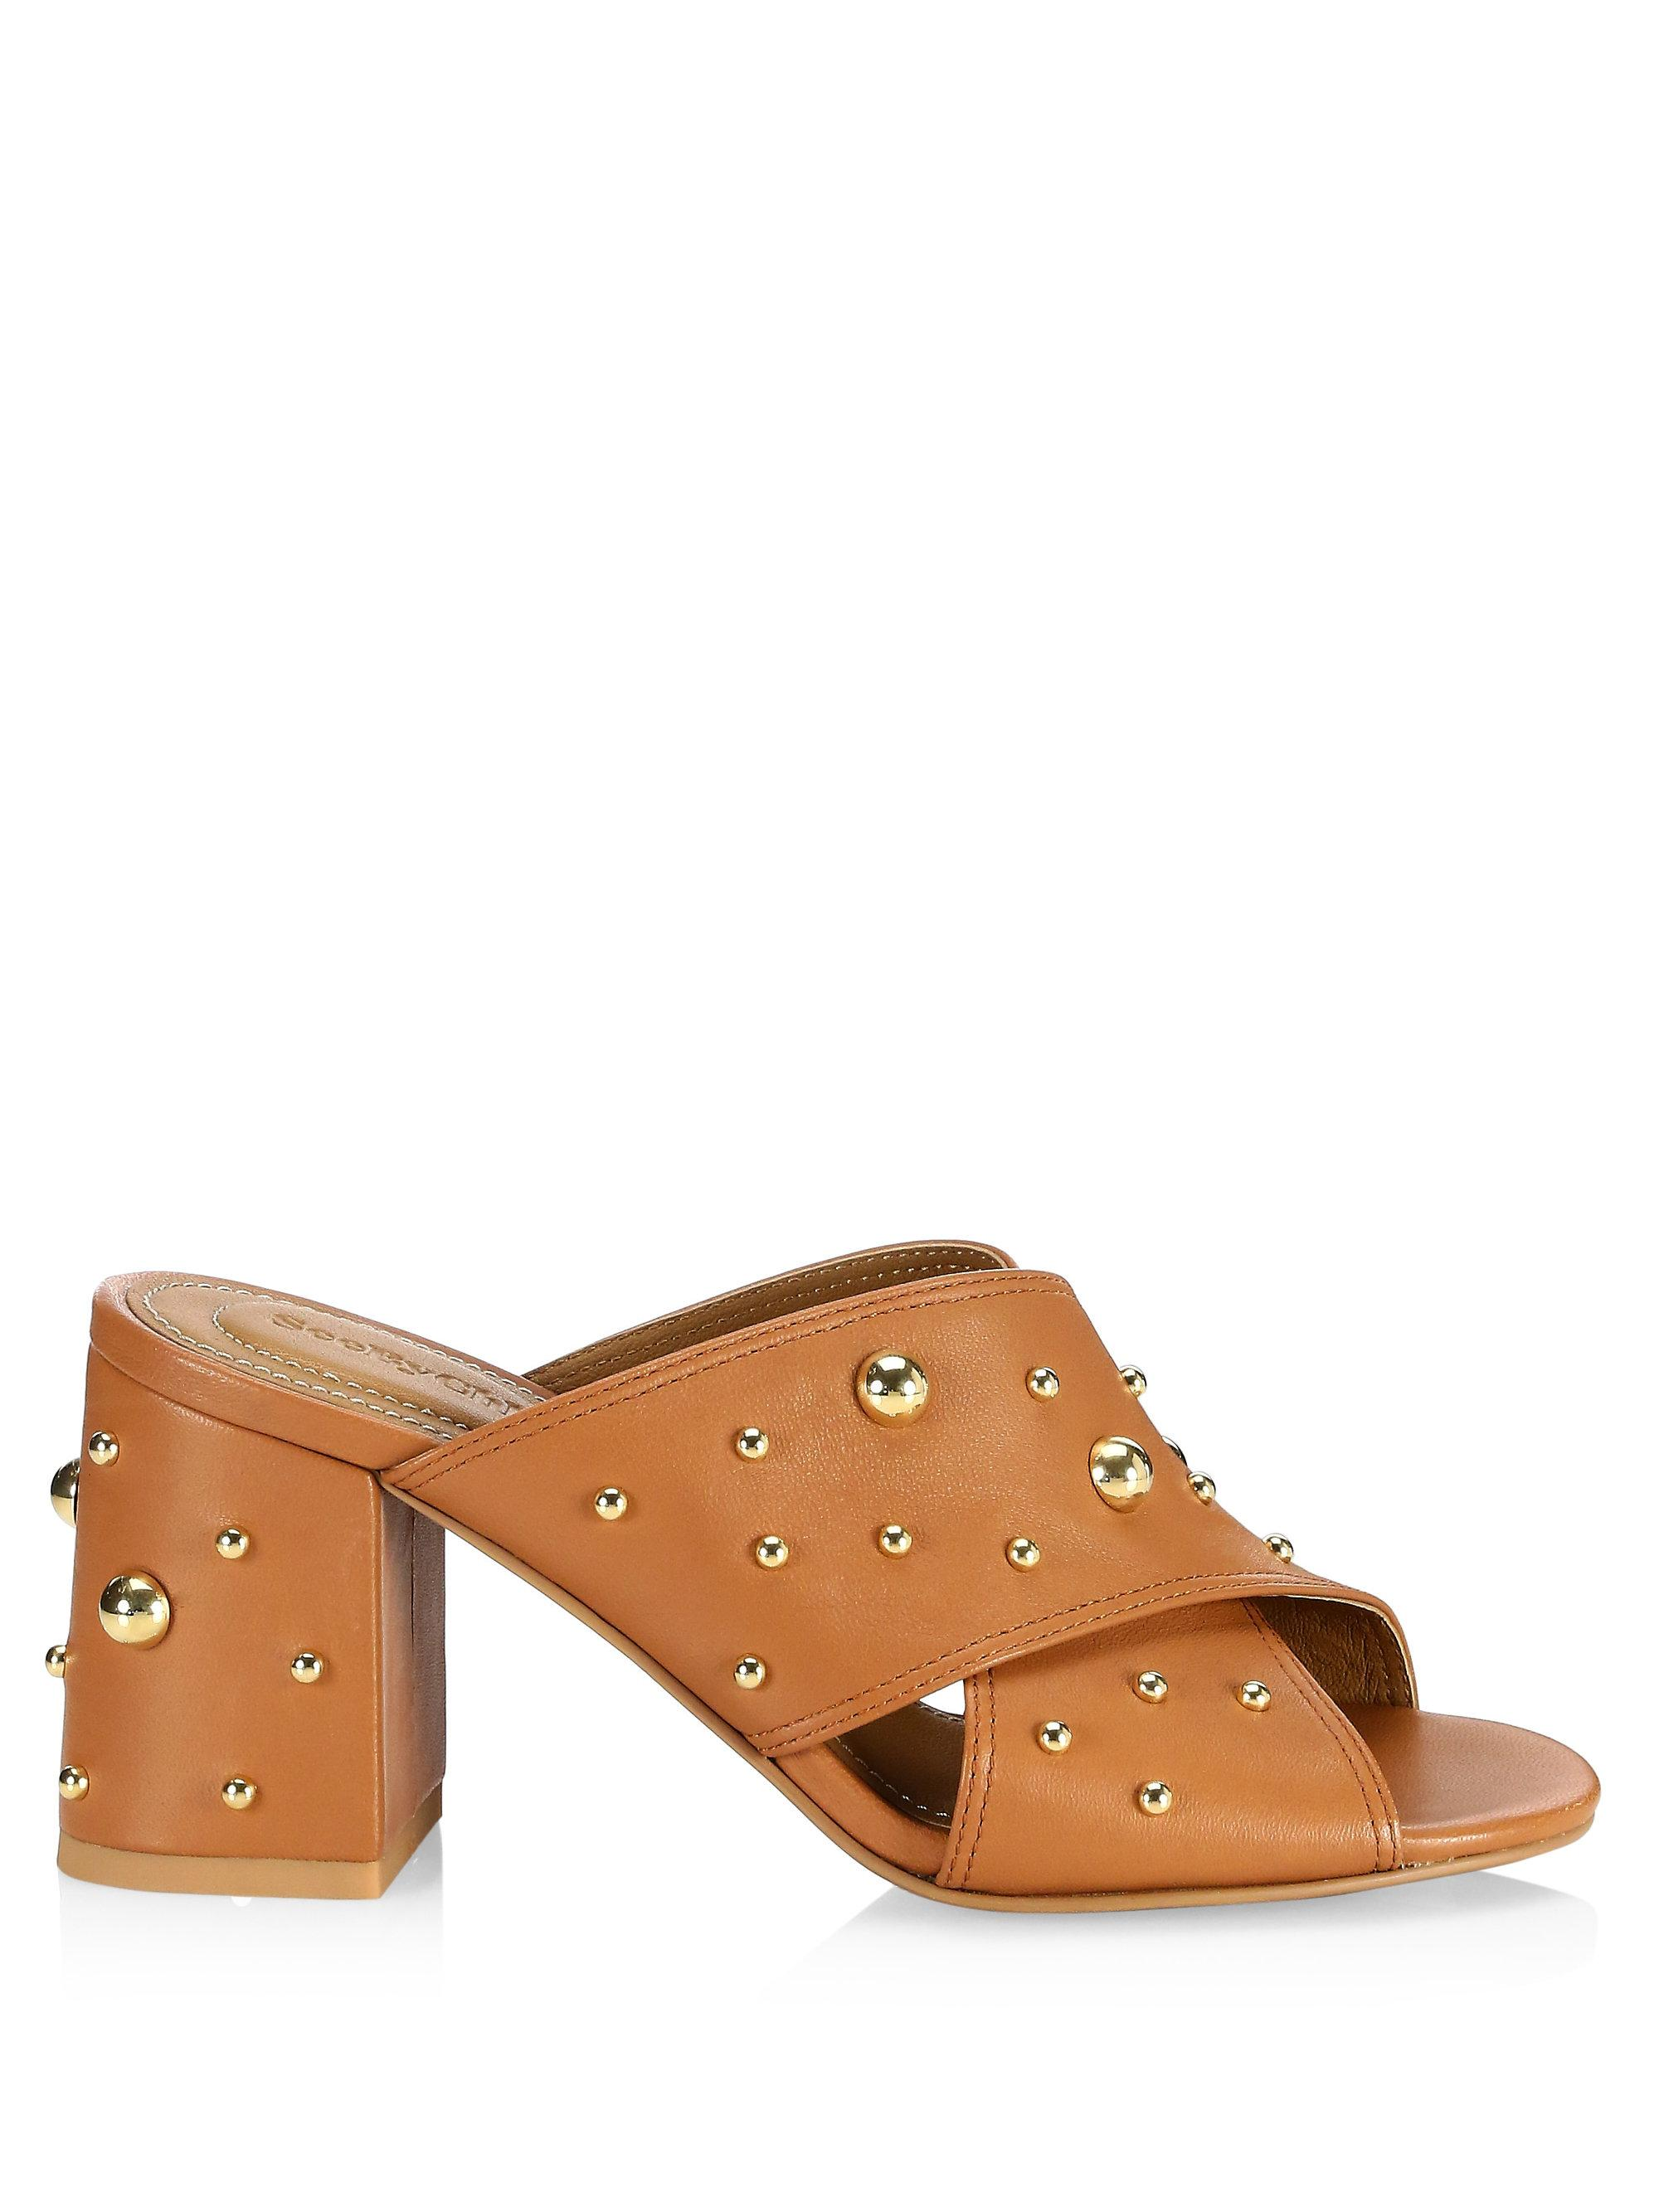 Chloé Abby Crisscross Sandals 7gxc8j